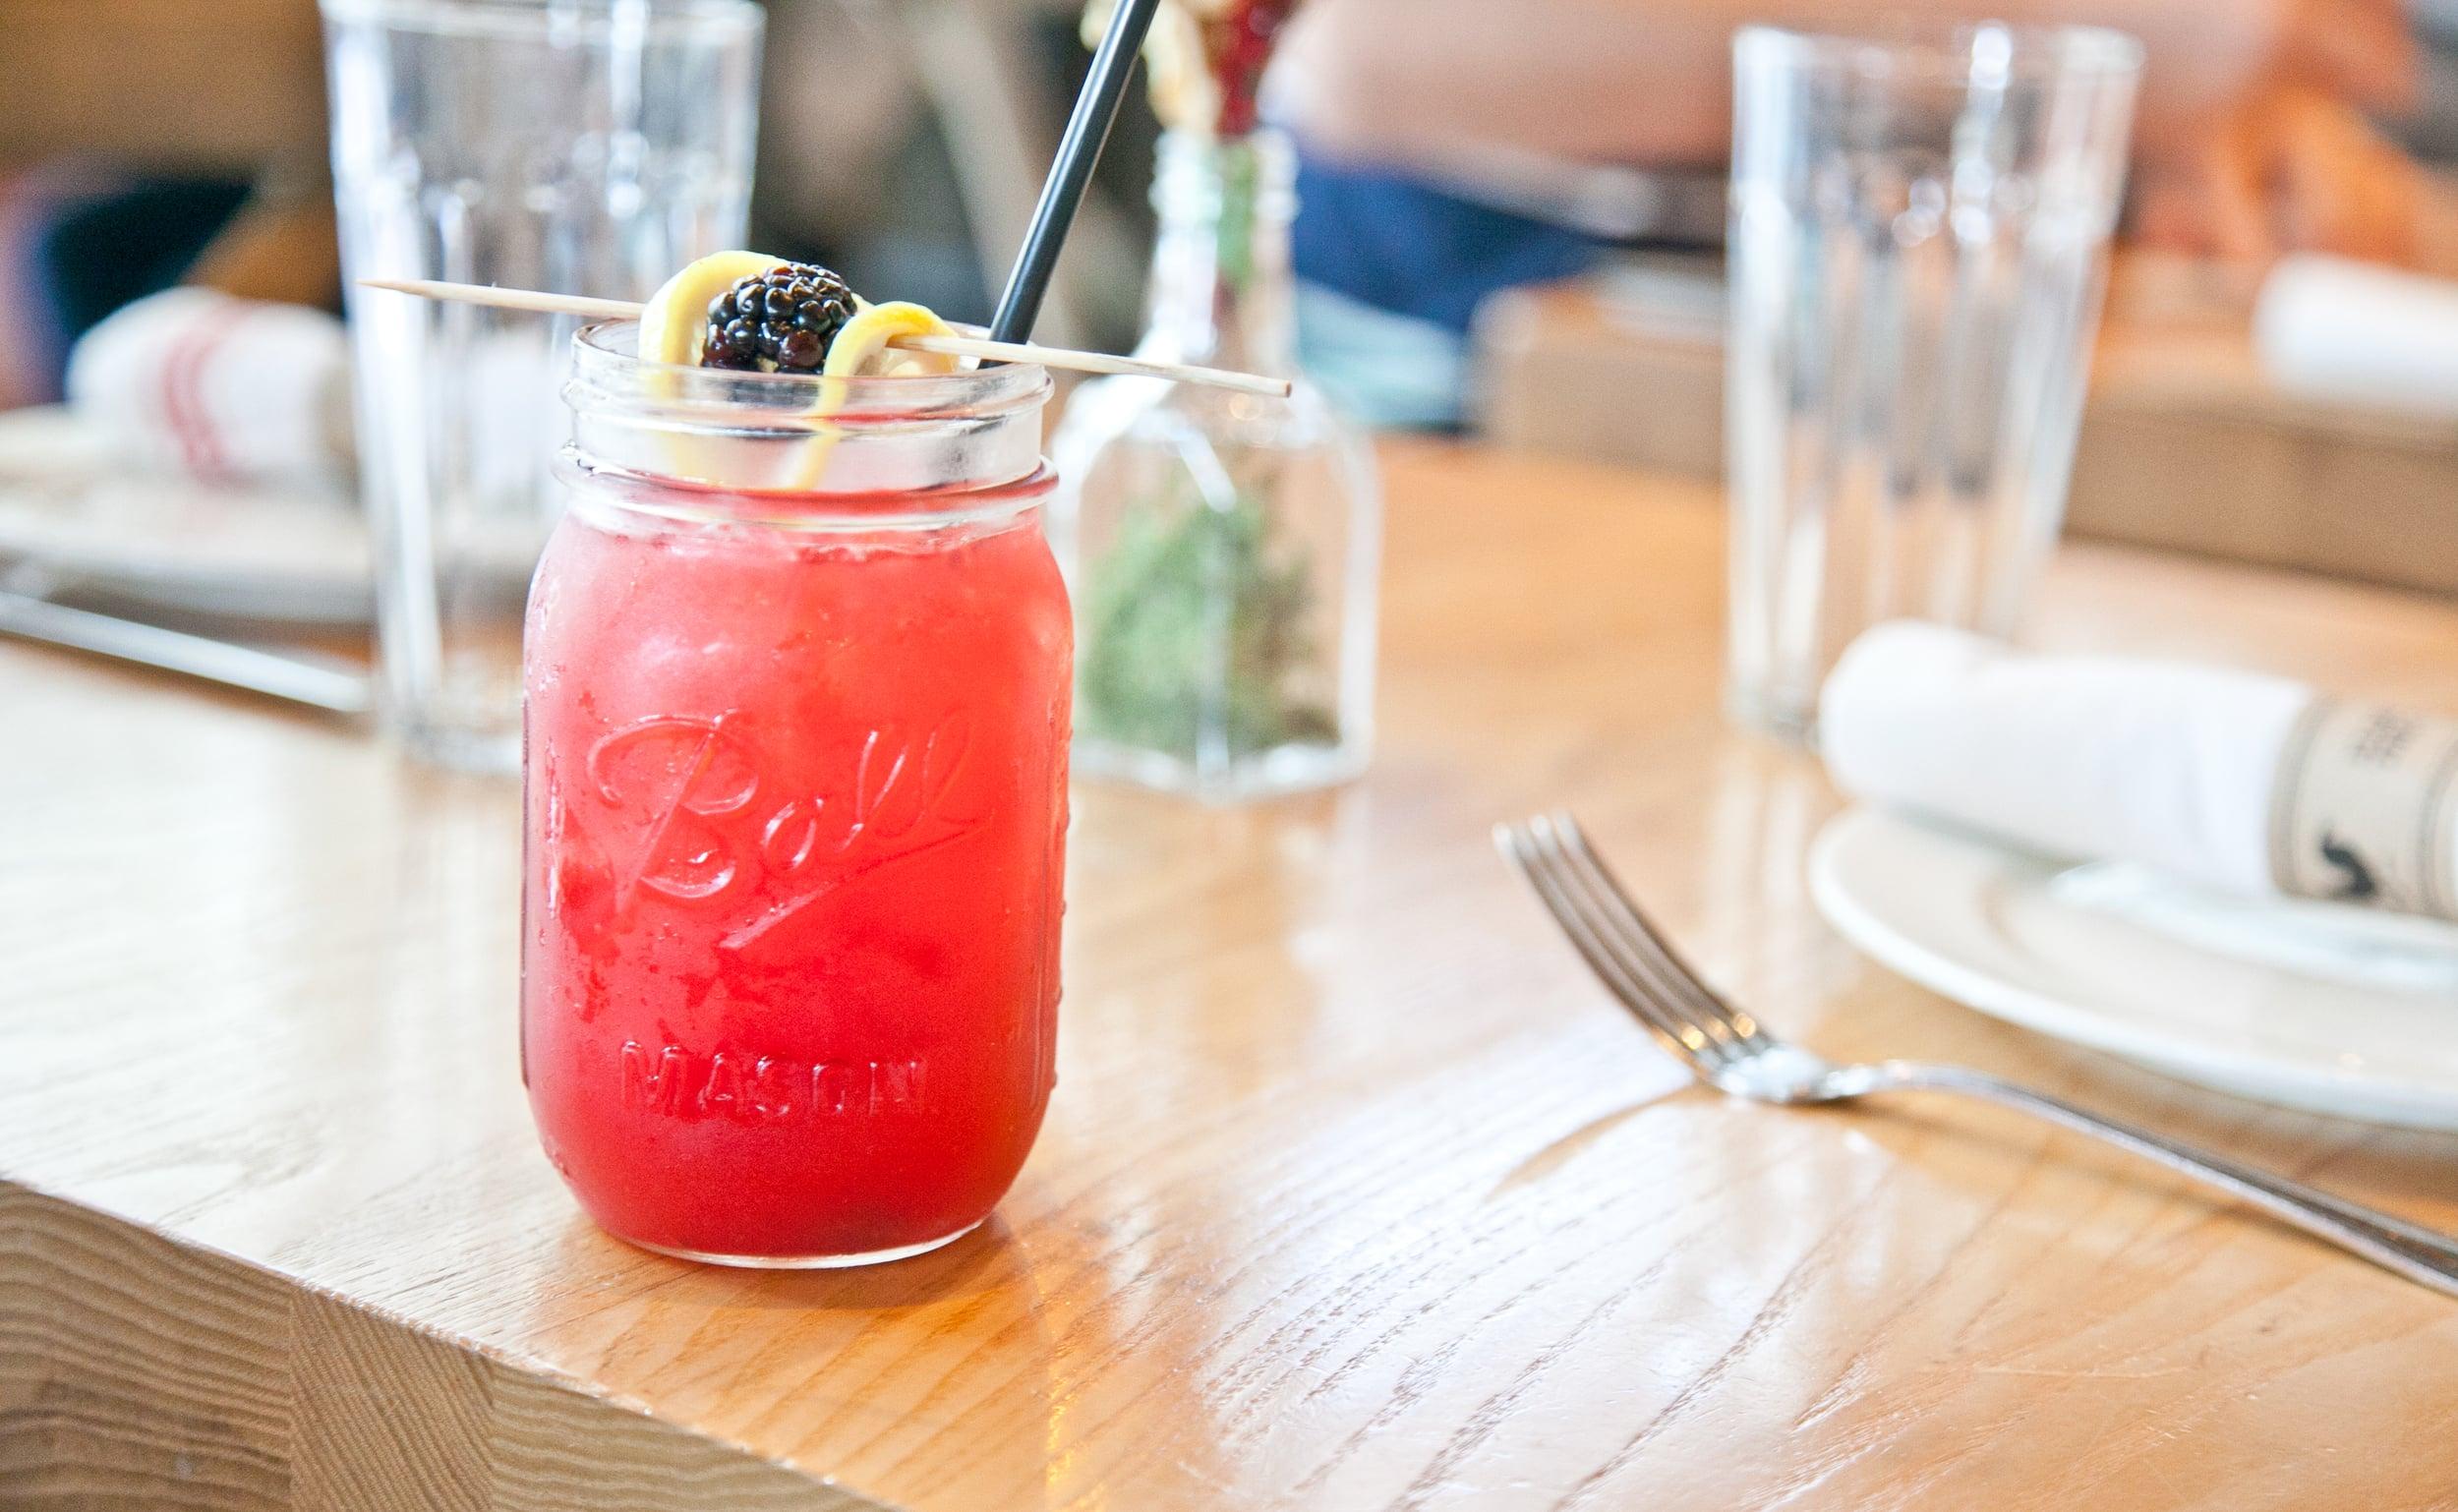 trisa-taro-miami-food-yardbird-southern-table-and-bar-drink.jpg